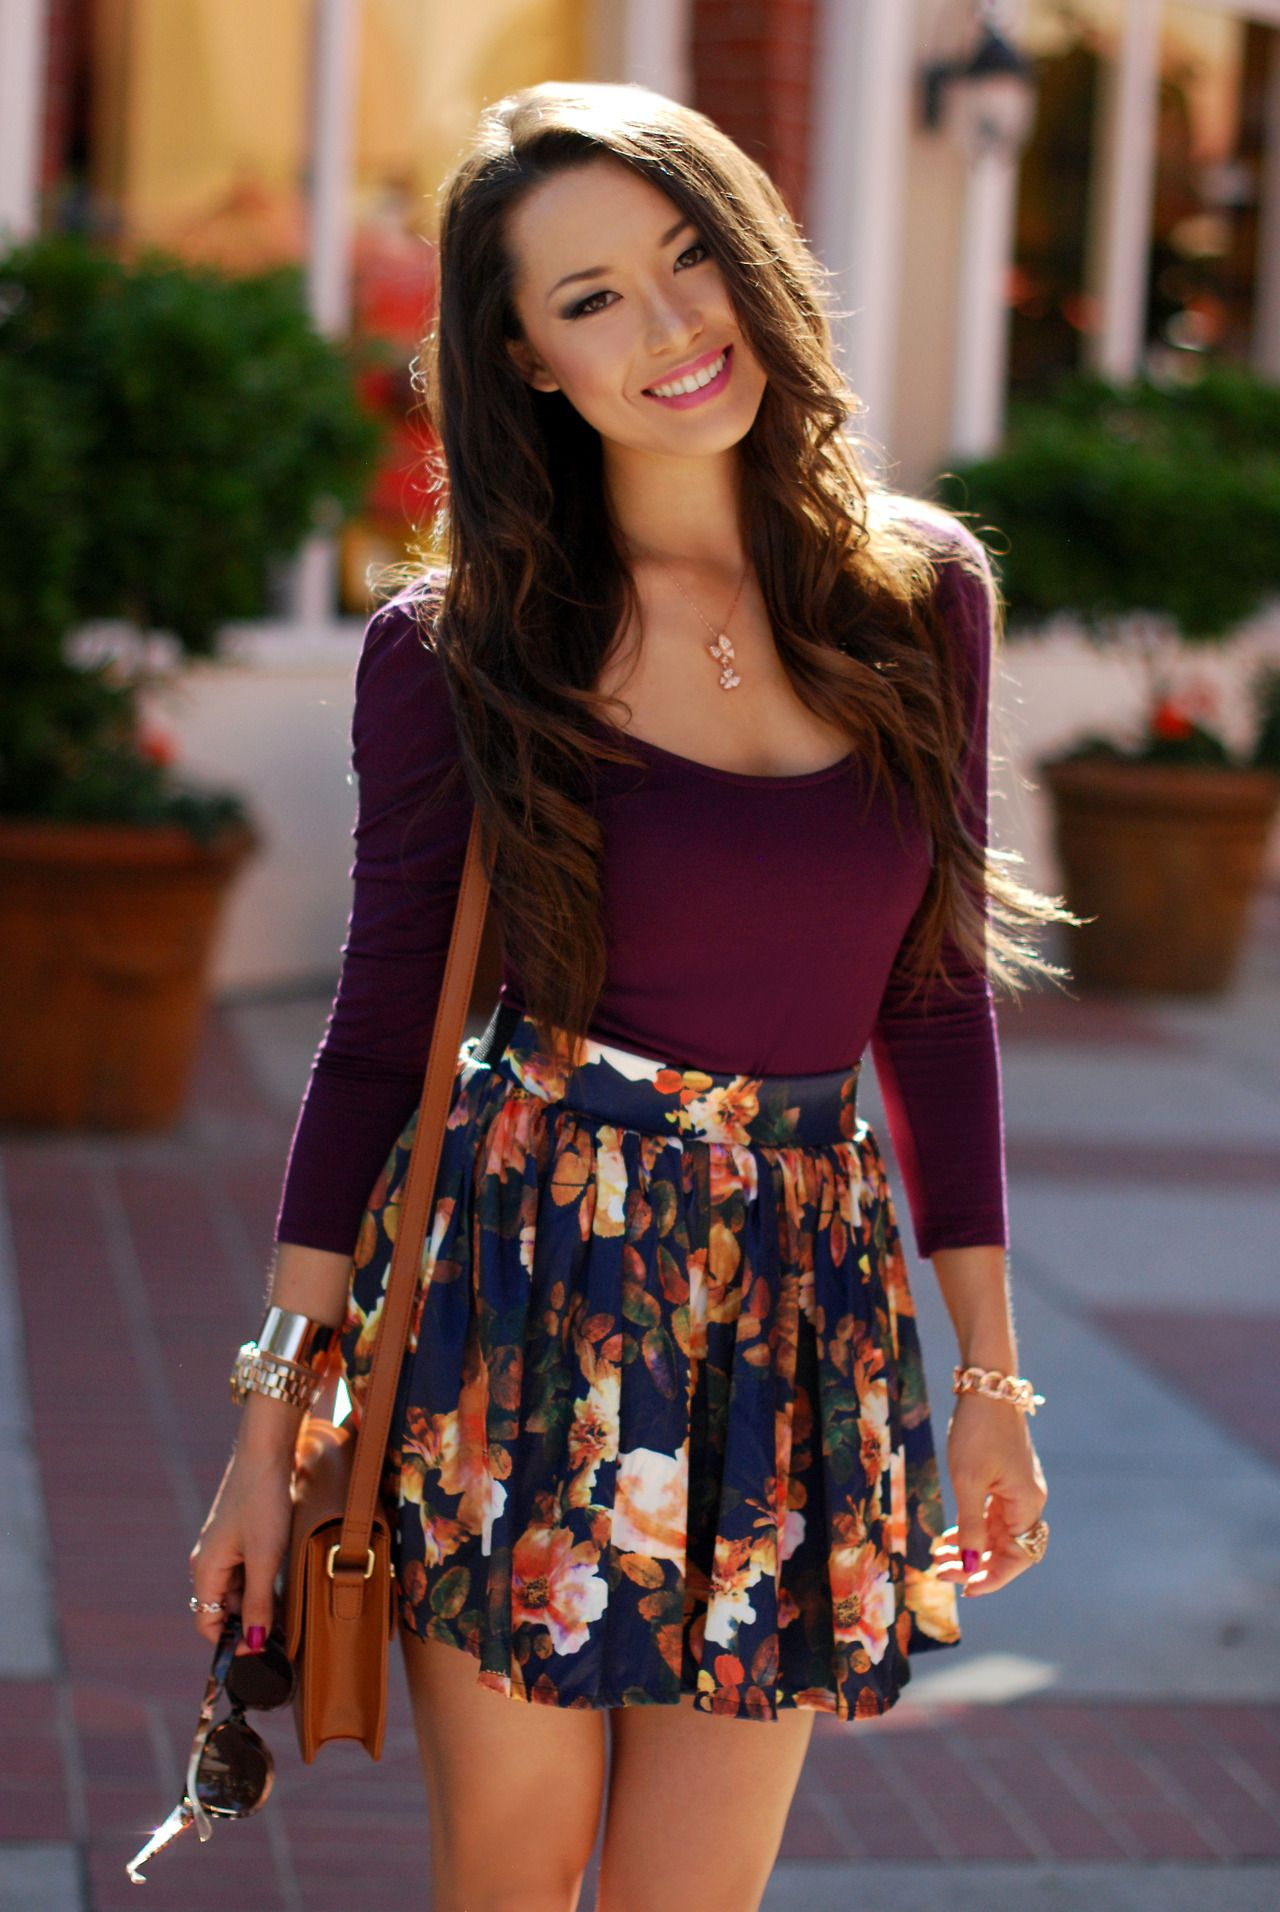 d36968b6906 Woman. Fashion. Light. Summer. Short. Skirt. Wayfair. Flowers. Dark.  Beautiful. Lips. Tight. Slim.